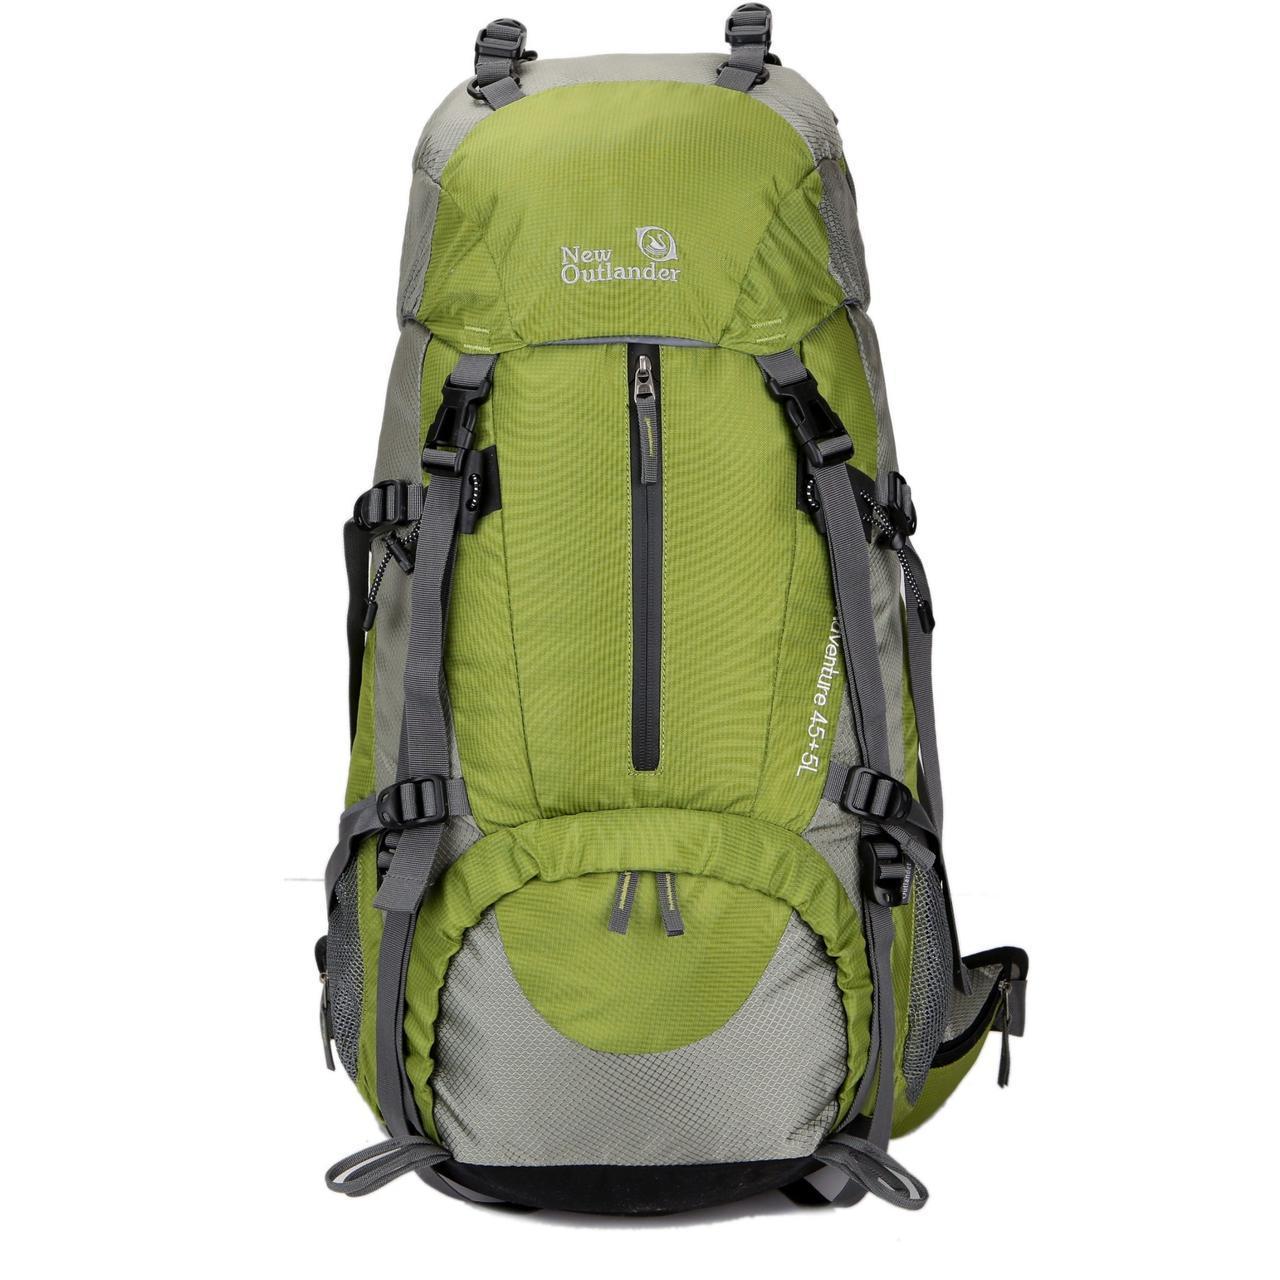 Рюкзак для туризма на 45-50 литров New Outlander зеленый (AV 1009)